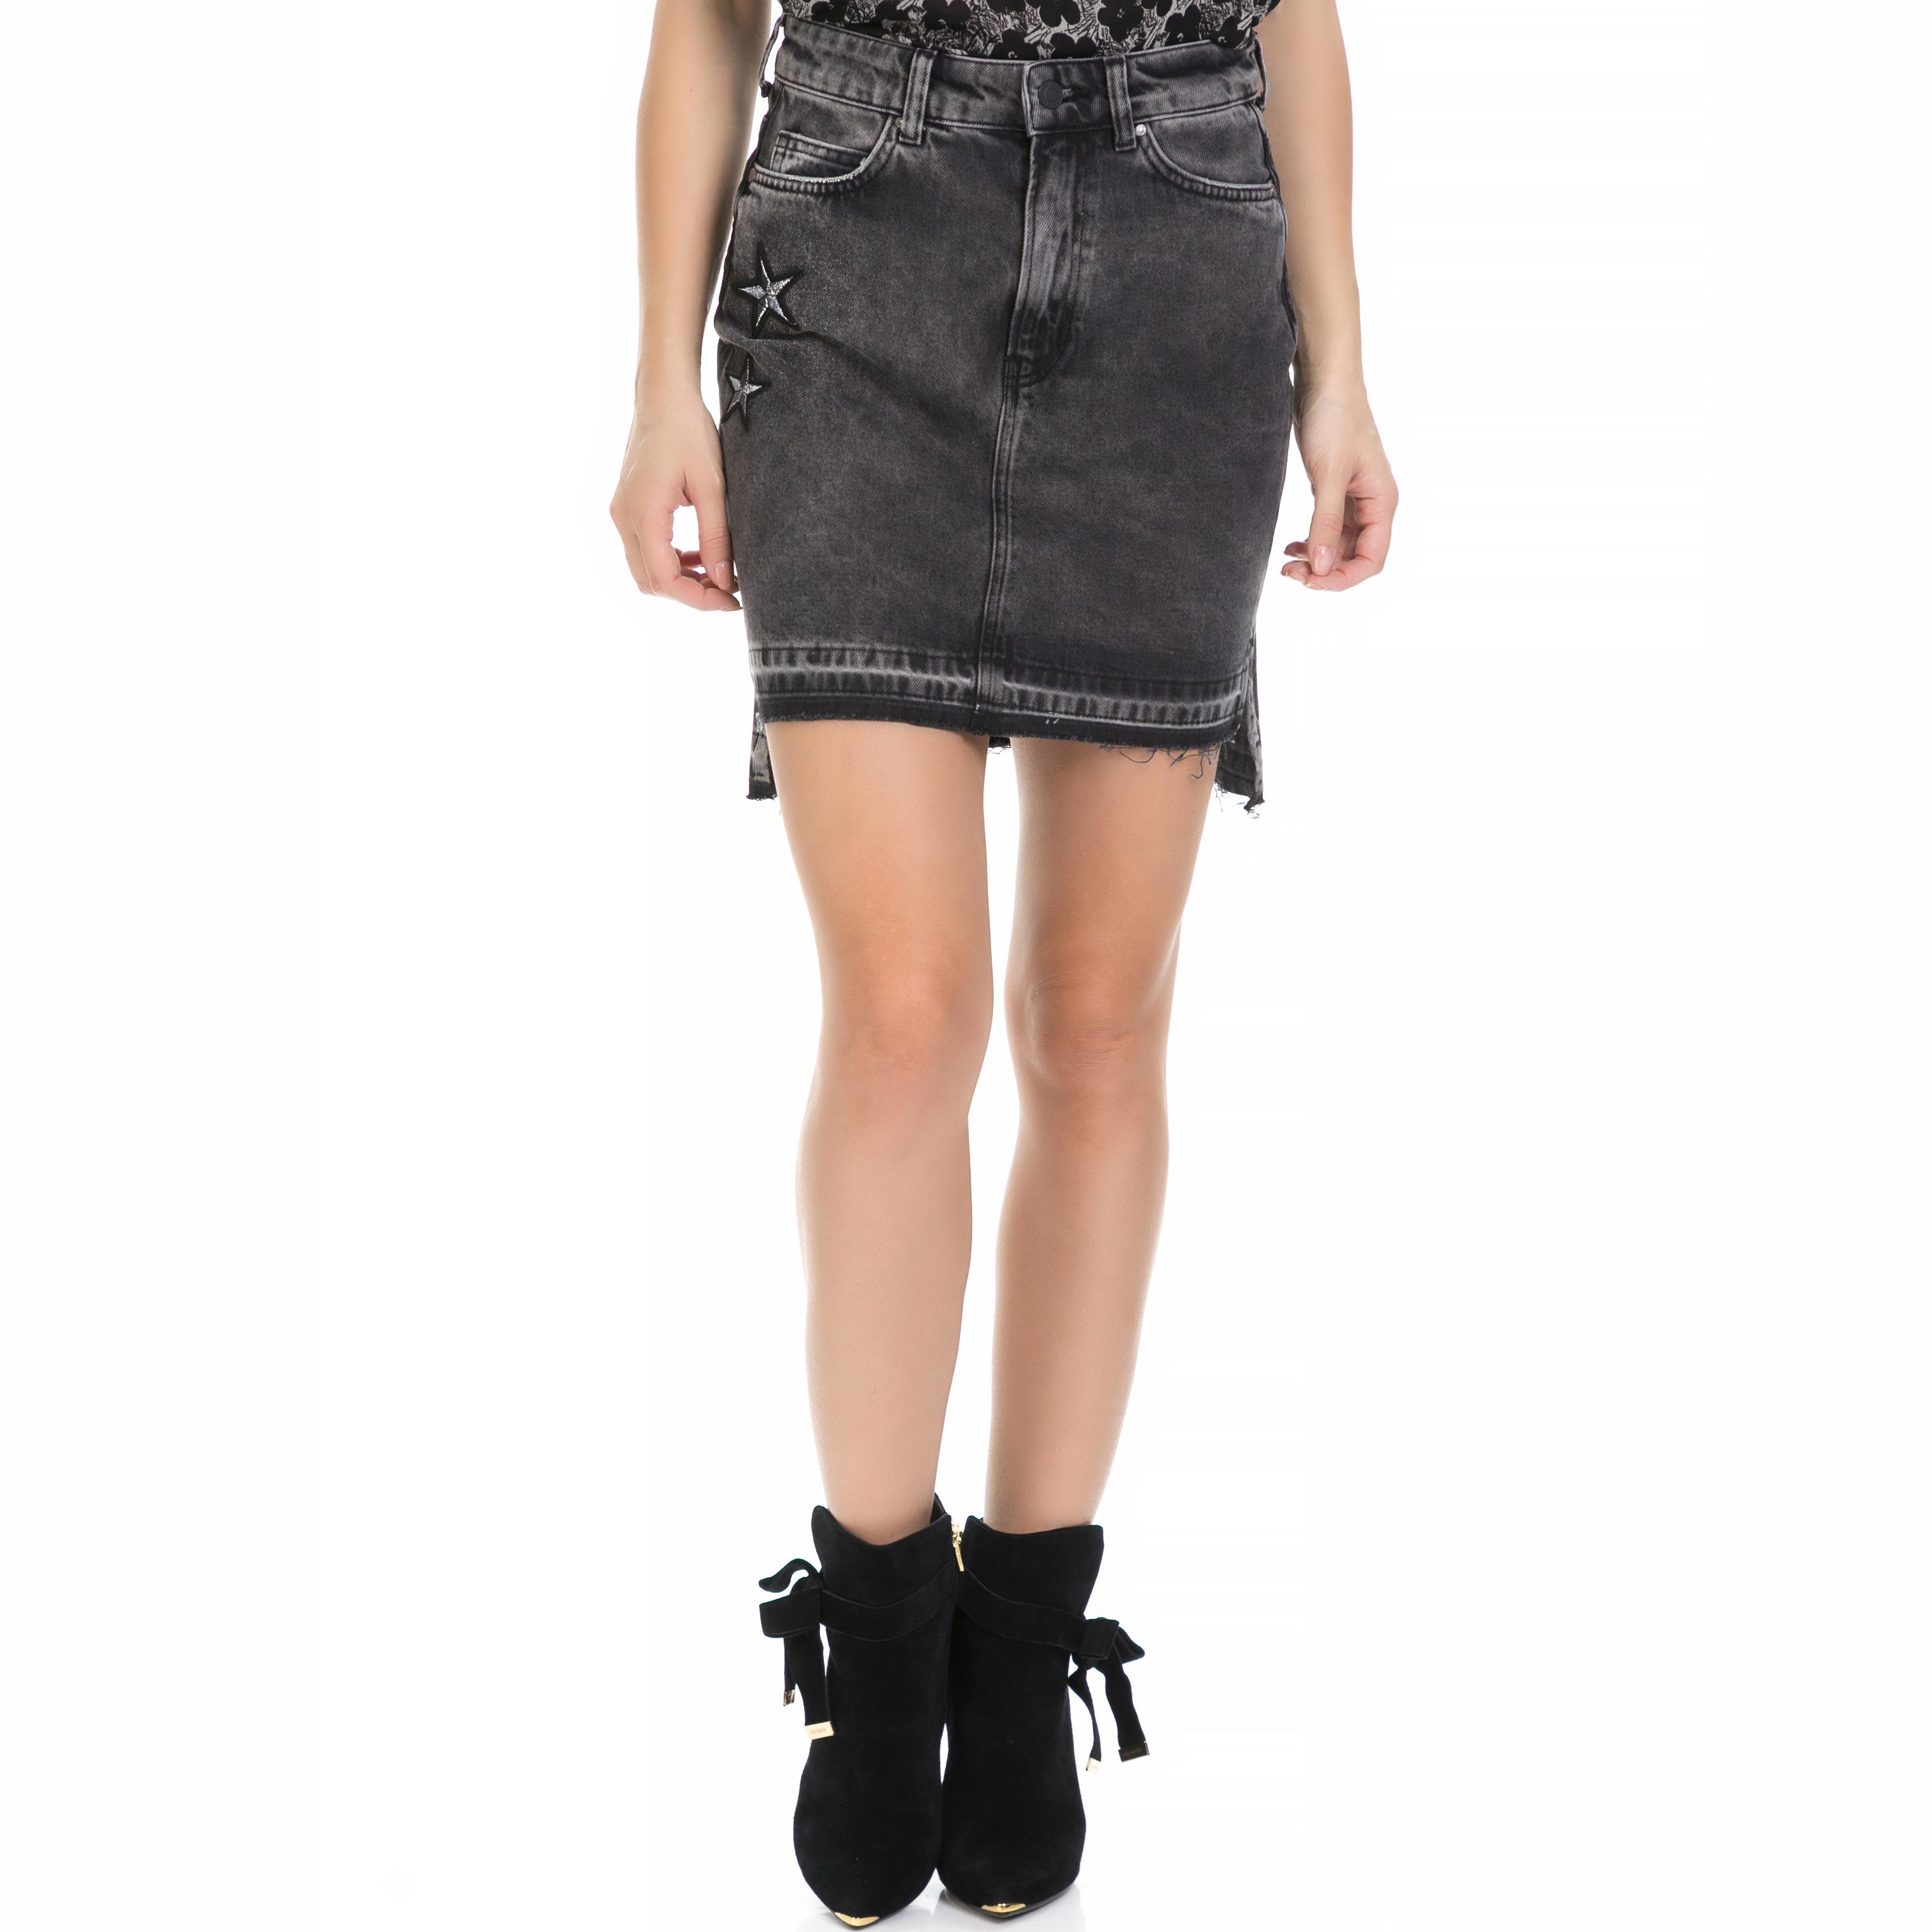 GUESS – Γυναικεία τζιν φούστα KARIN GUESS γκρι